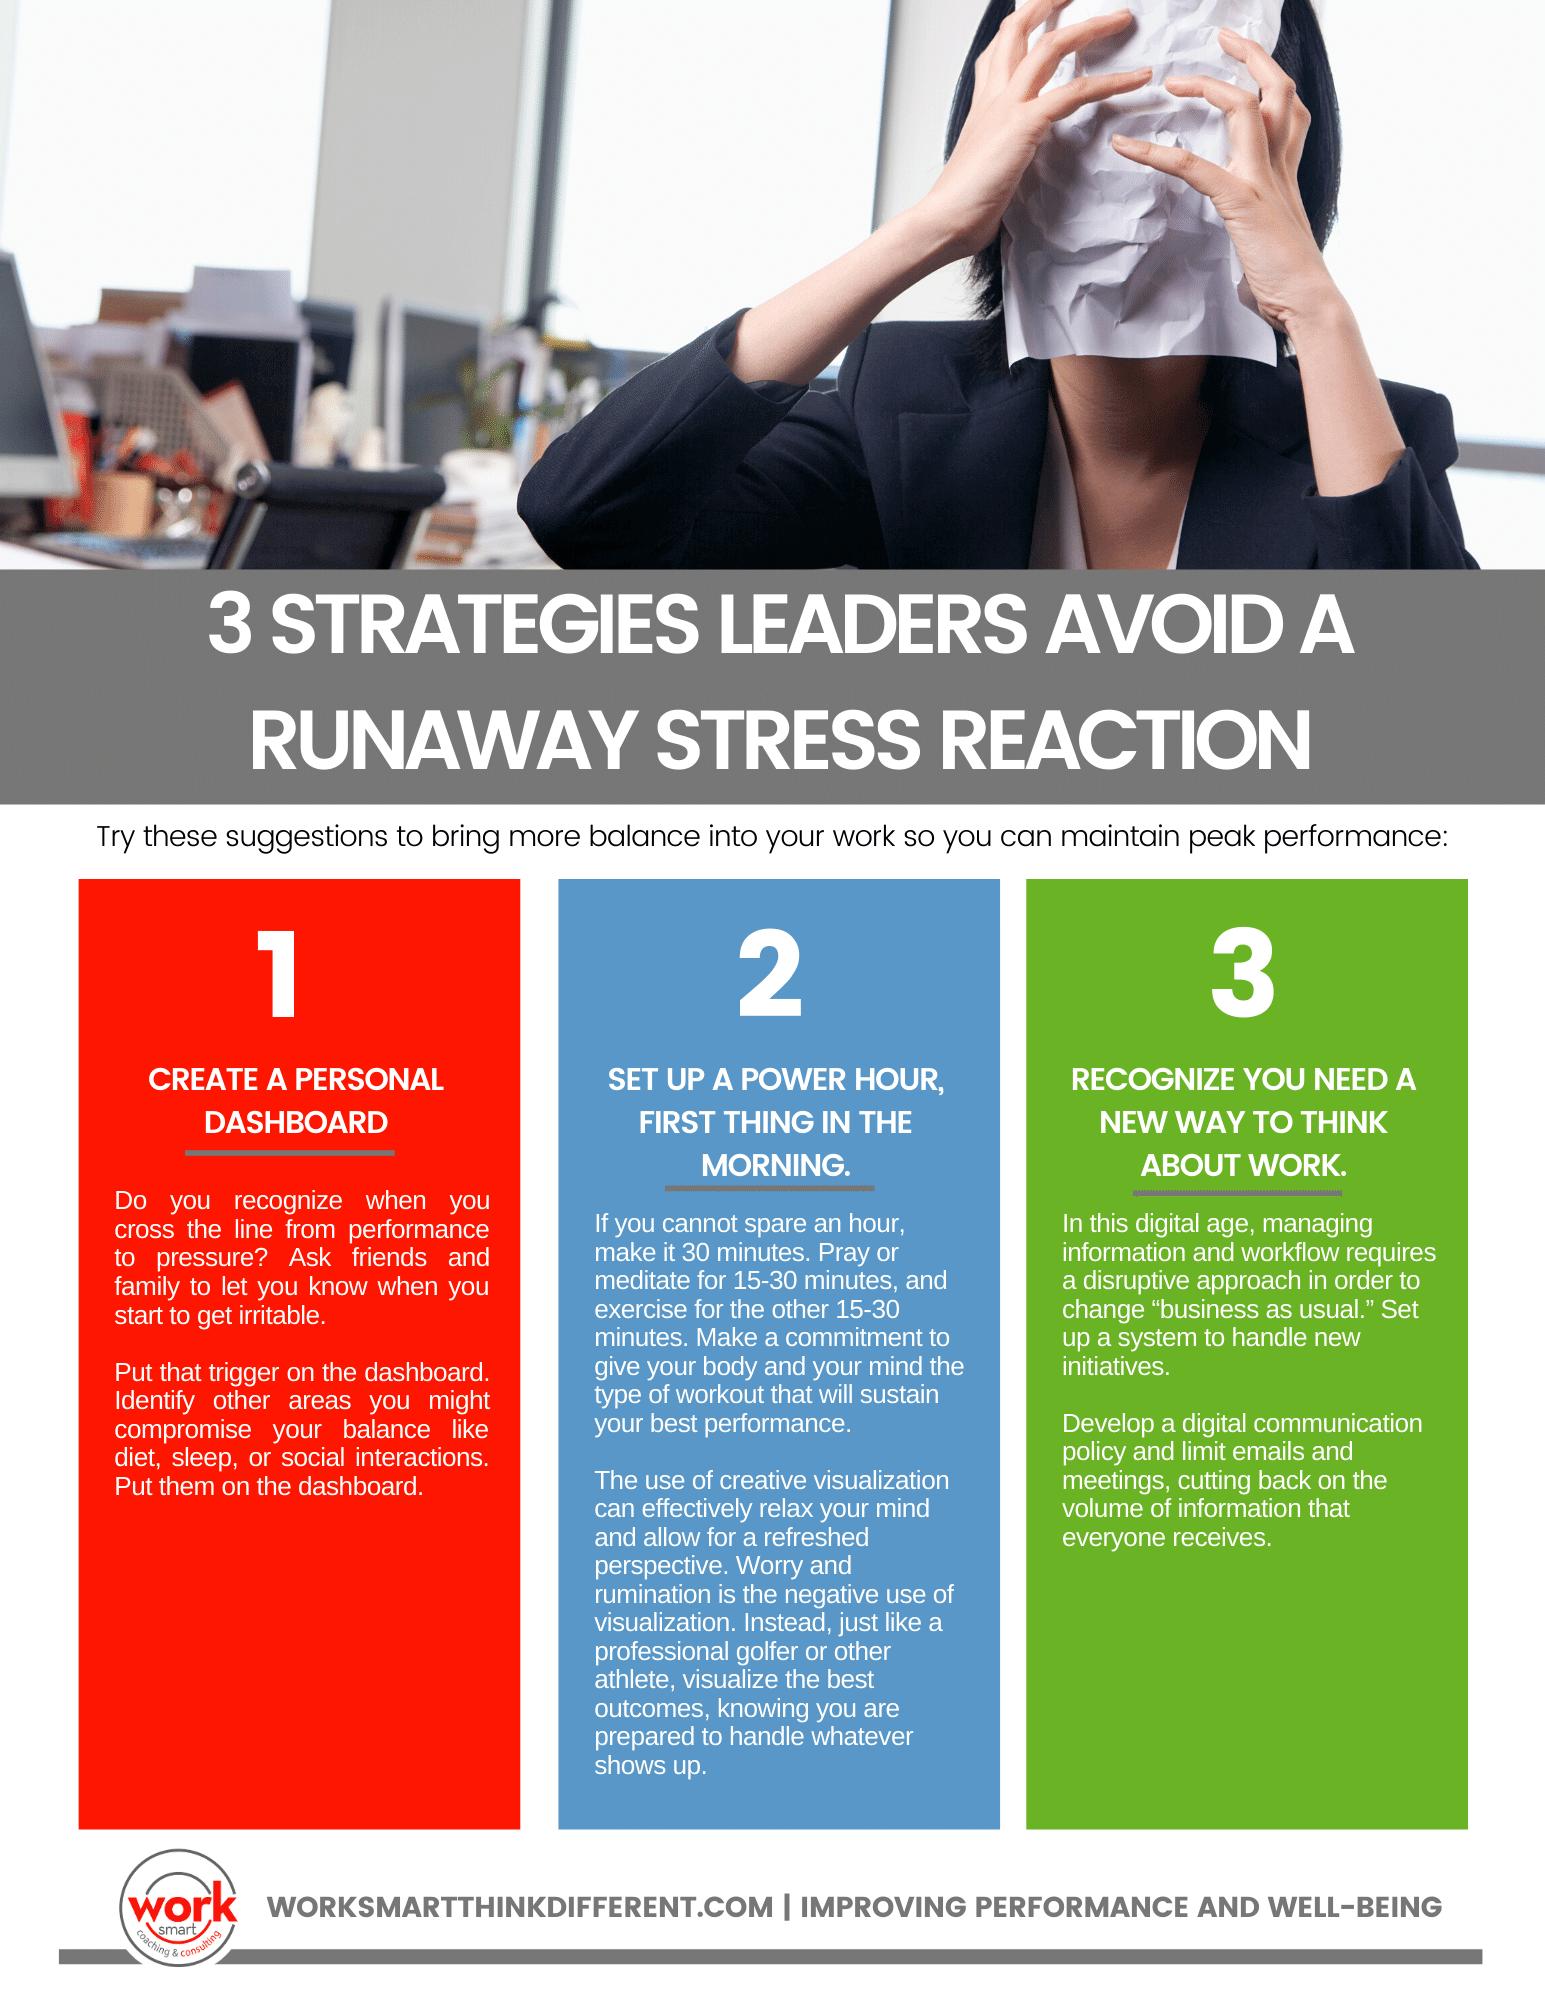 3 Strategies leaders Avoid a Runaway Stress Reaction